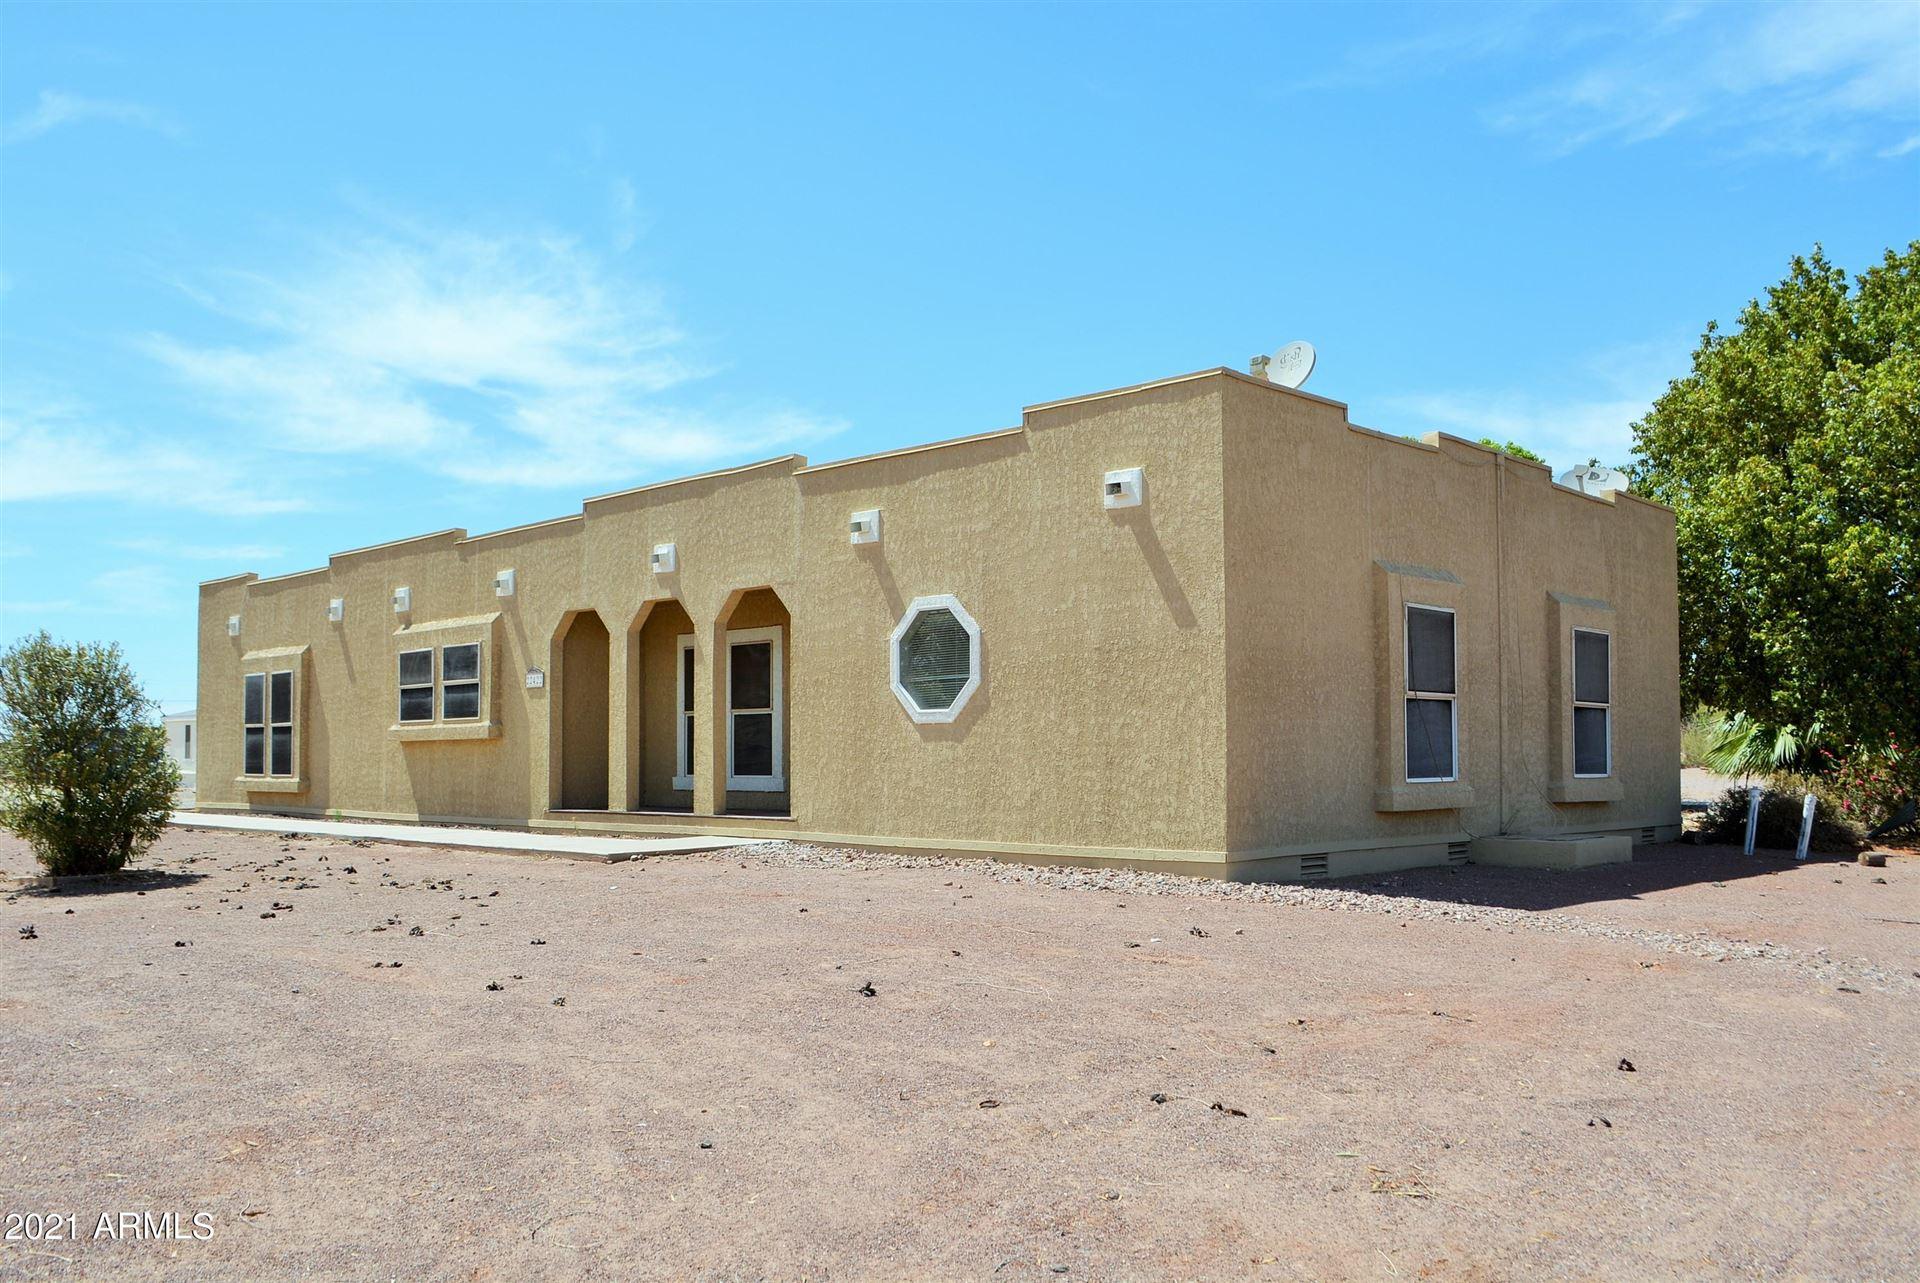 Photo of 22422 W PEAK VIEW Road, Wittmann, AZ 85361 (MLS # 6236974)